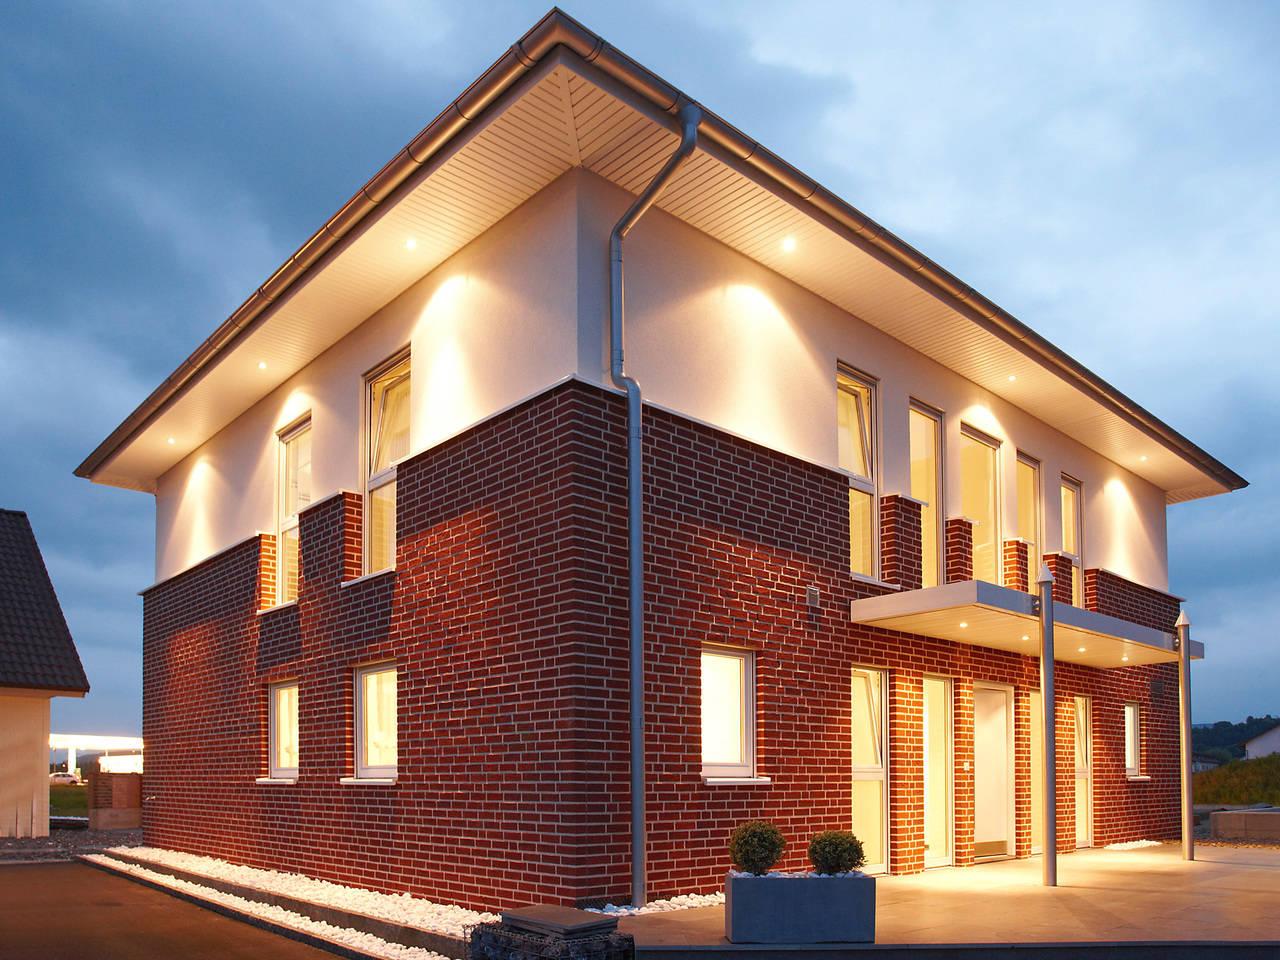 Musterhaus Kaiseraugst von Gussek Haus - beleuchtet